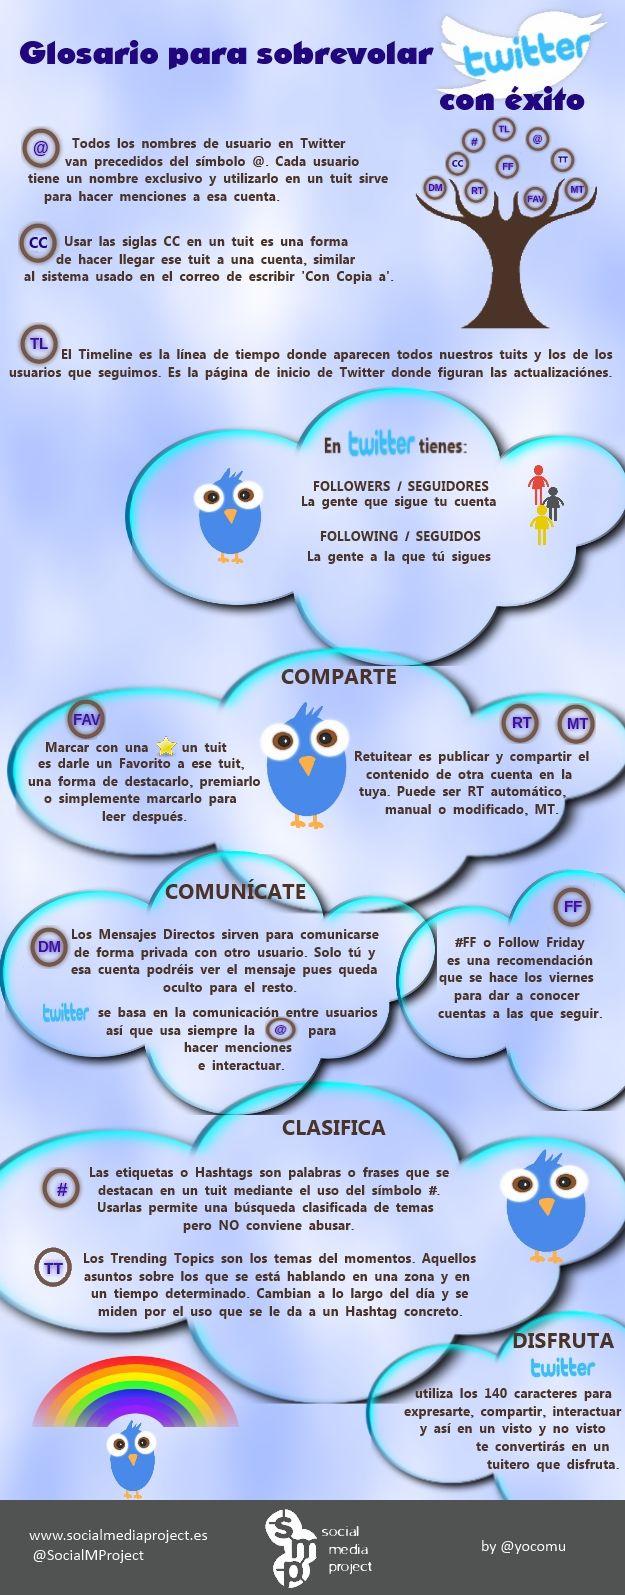 #Infografía - Cómo aprender a volar en #Twitter !! #SocialMedia  Infografia_Glosario_basico_Twitter__SocialMediaProject_by_Yolanda_Corral